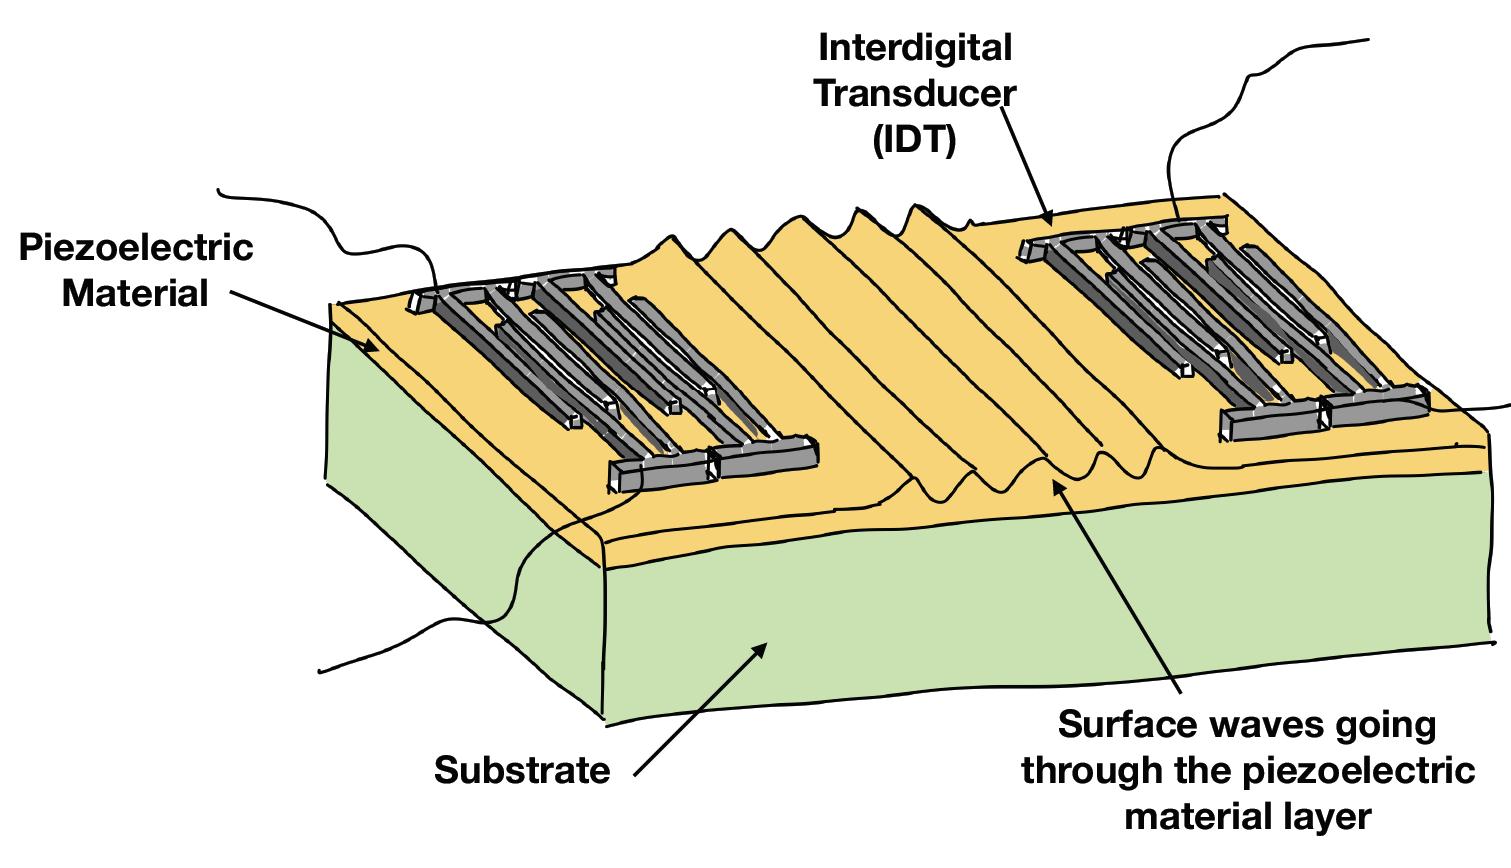 Piezoelectric Material